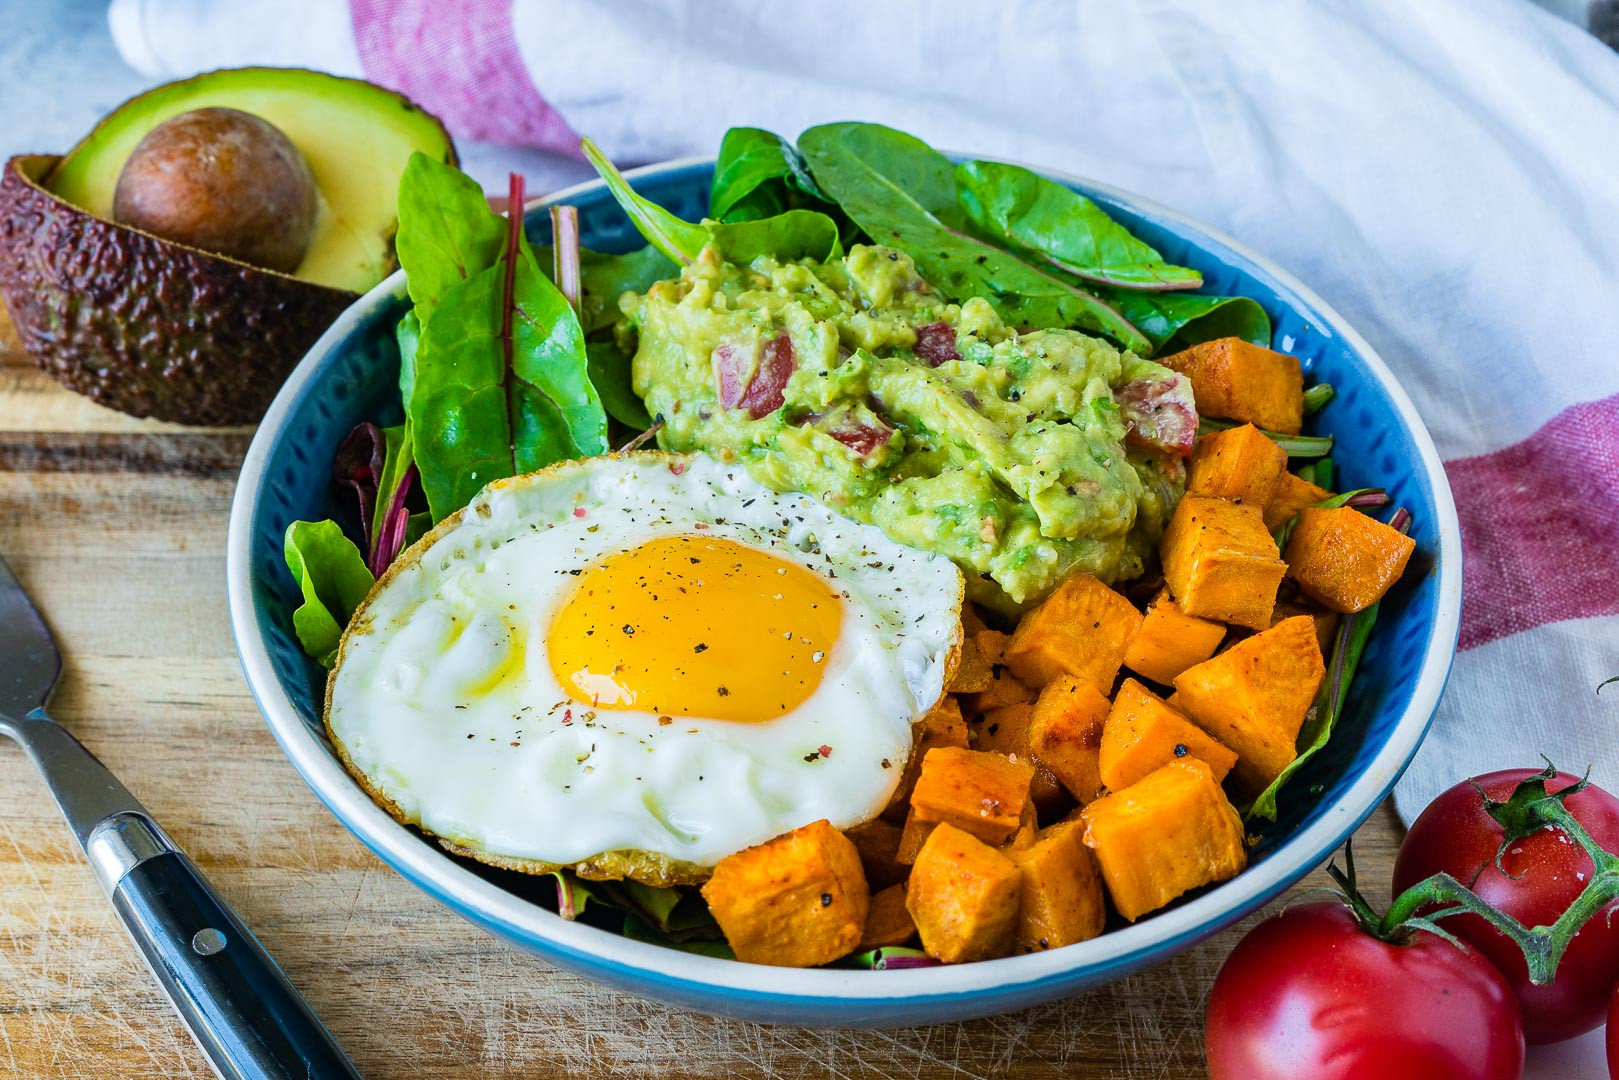 Healthy Breakfast Bowls With Eggs  Clean Eating Guacamole Egg Sweet Potato Breakfast Bowls